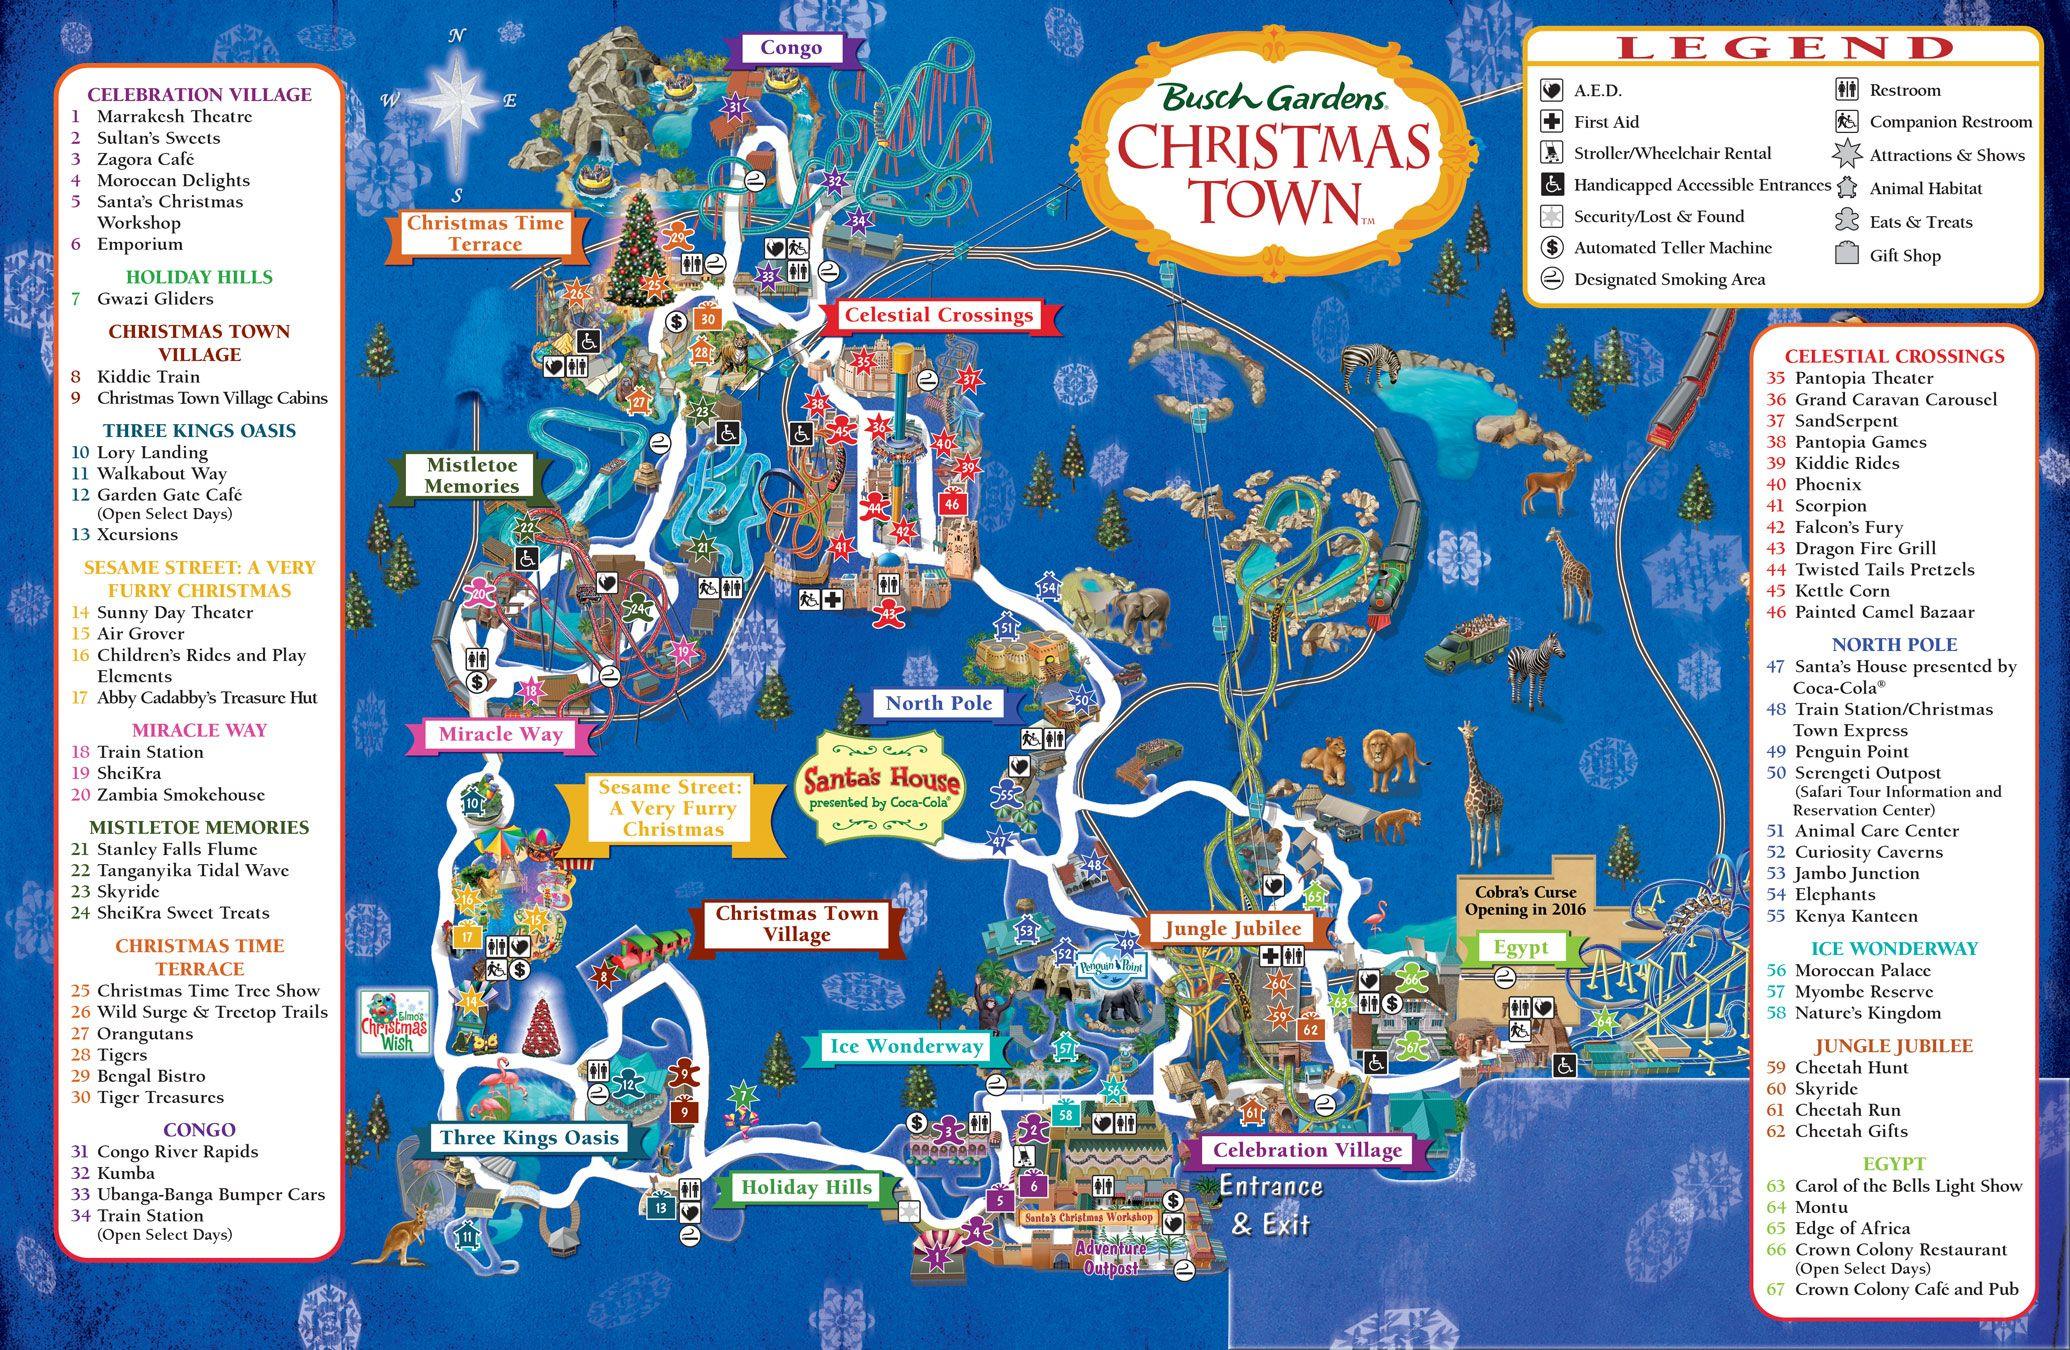 ec24a3de7c78dd5050b7feb2e2897bd8 - Busch Gardens Tampa Christmas Town Map